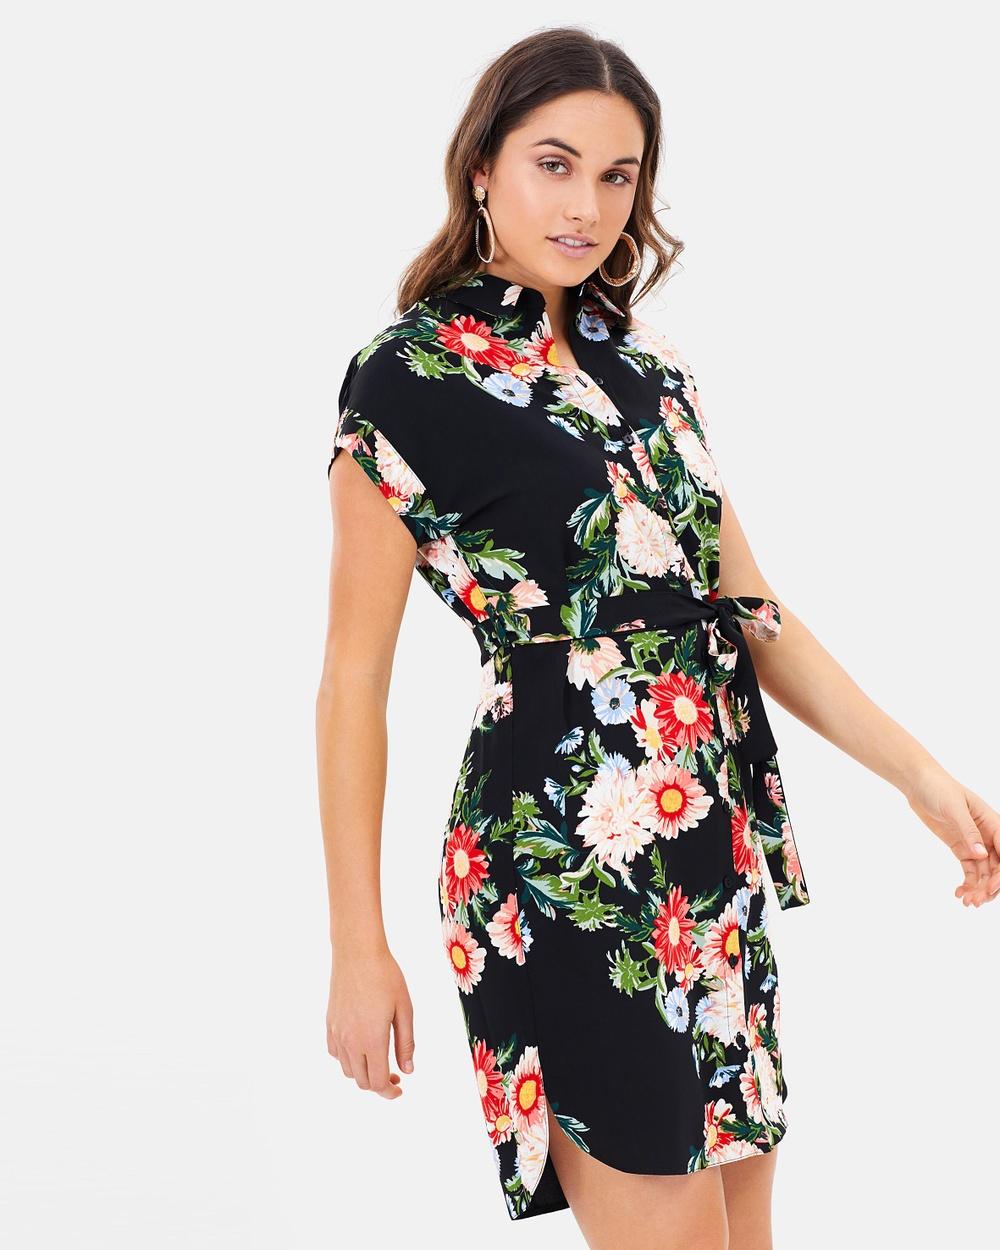 Dorothy Perkins Floral Print Shirt Dress Dresses Black Floral Print Shirt Dress